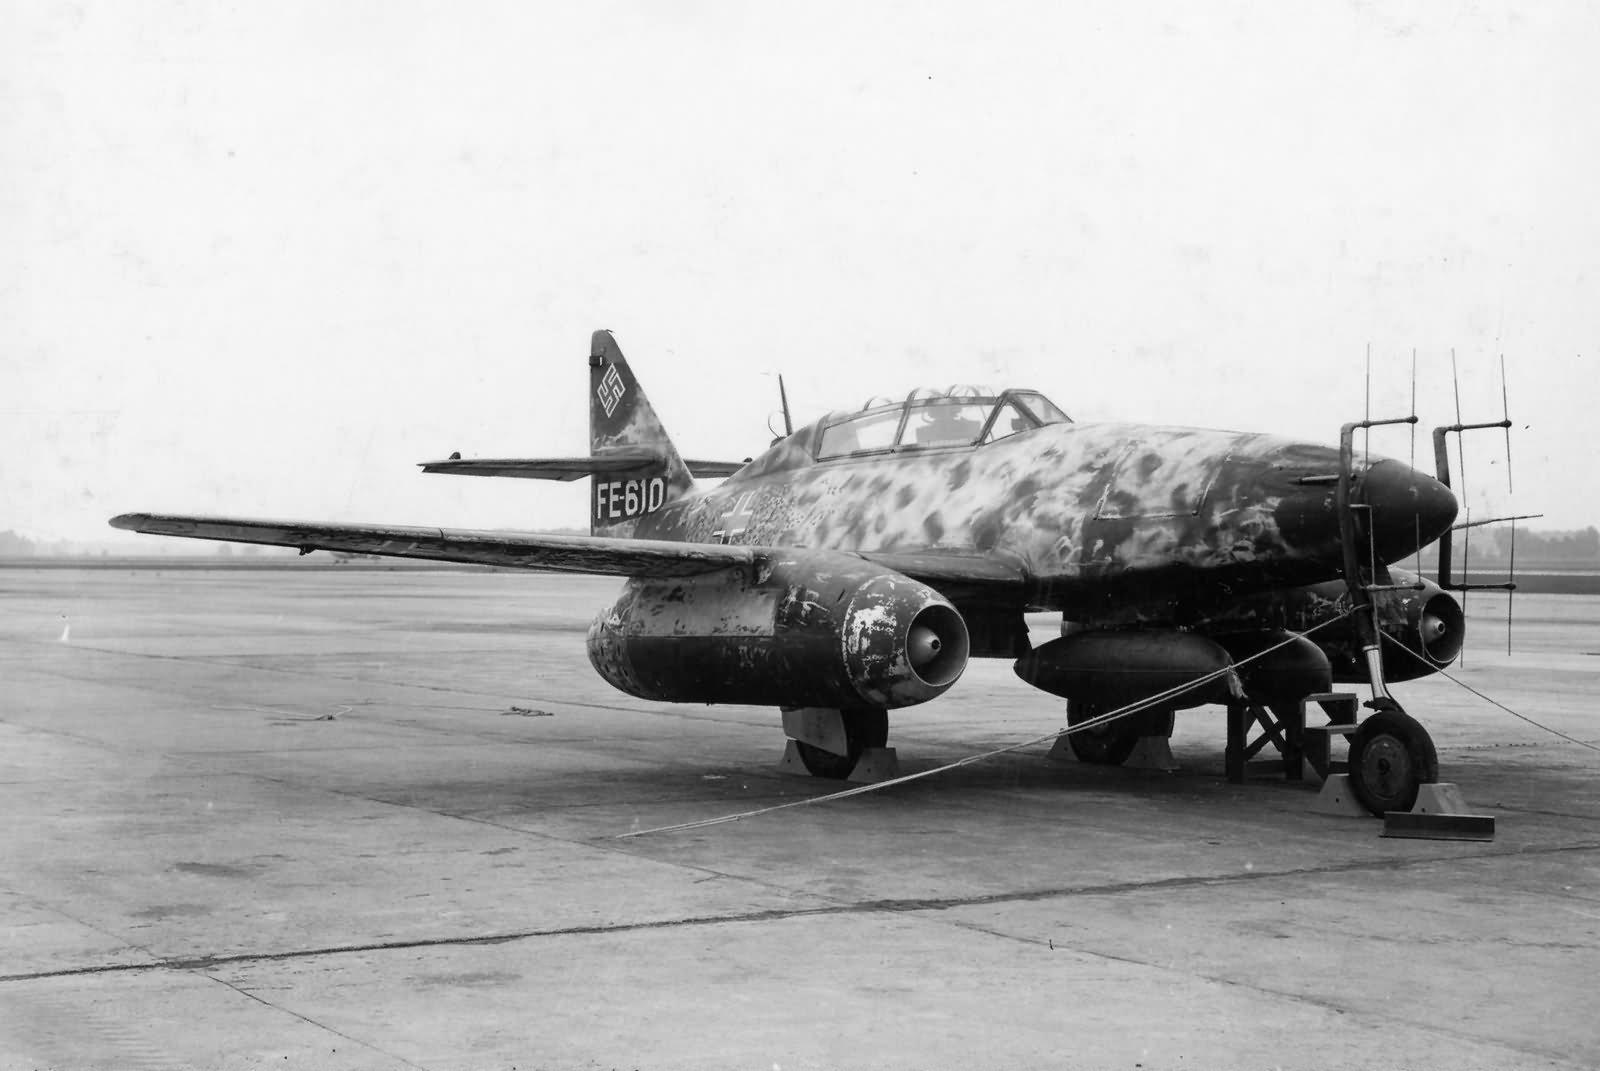 Me262B Jet Fighter in Germany 1945